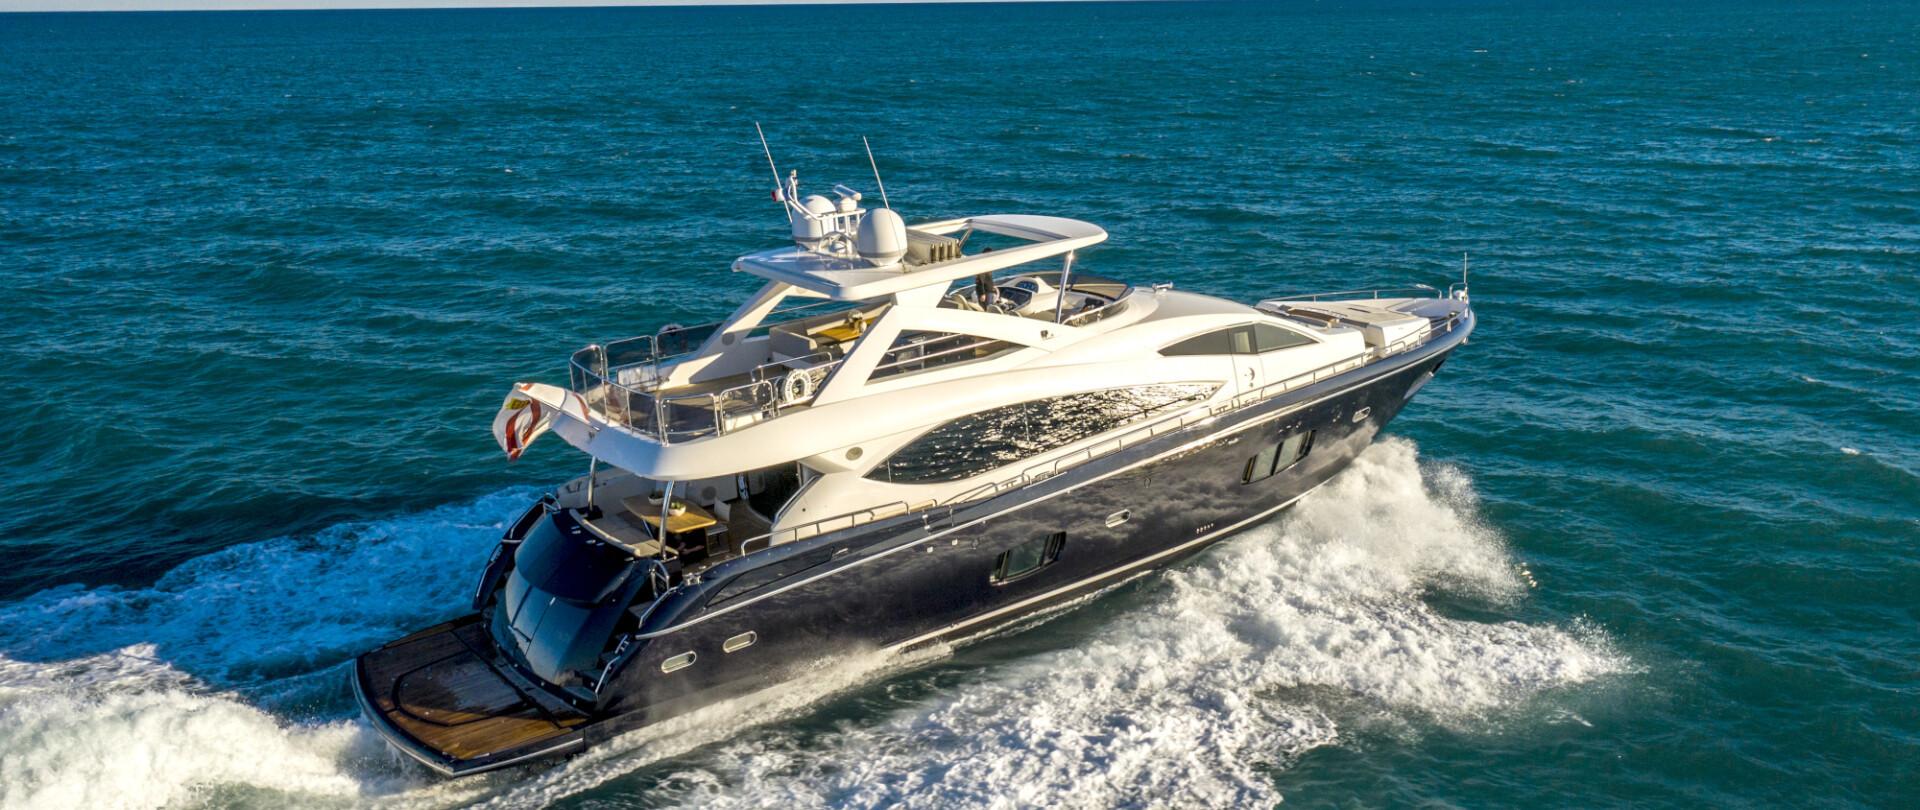 Yacht sold - Alfie Buoy photo 1